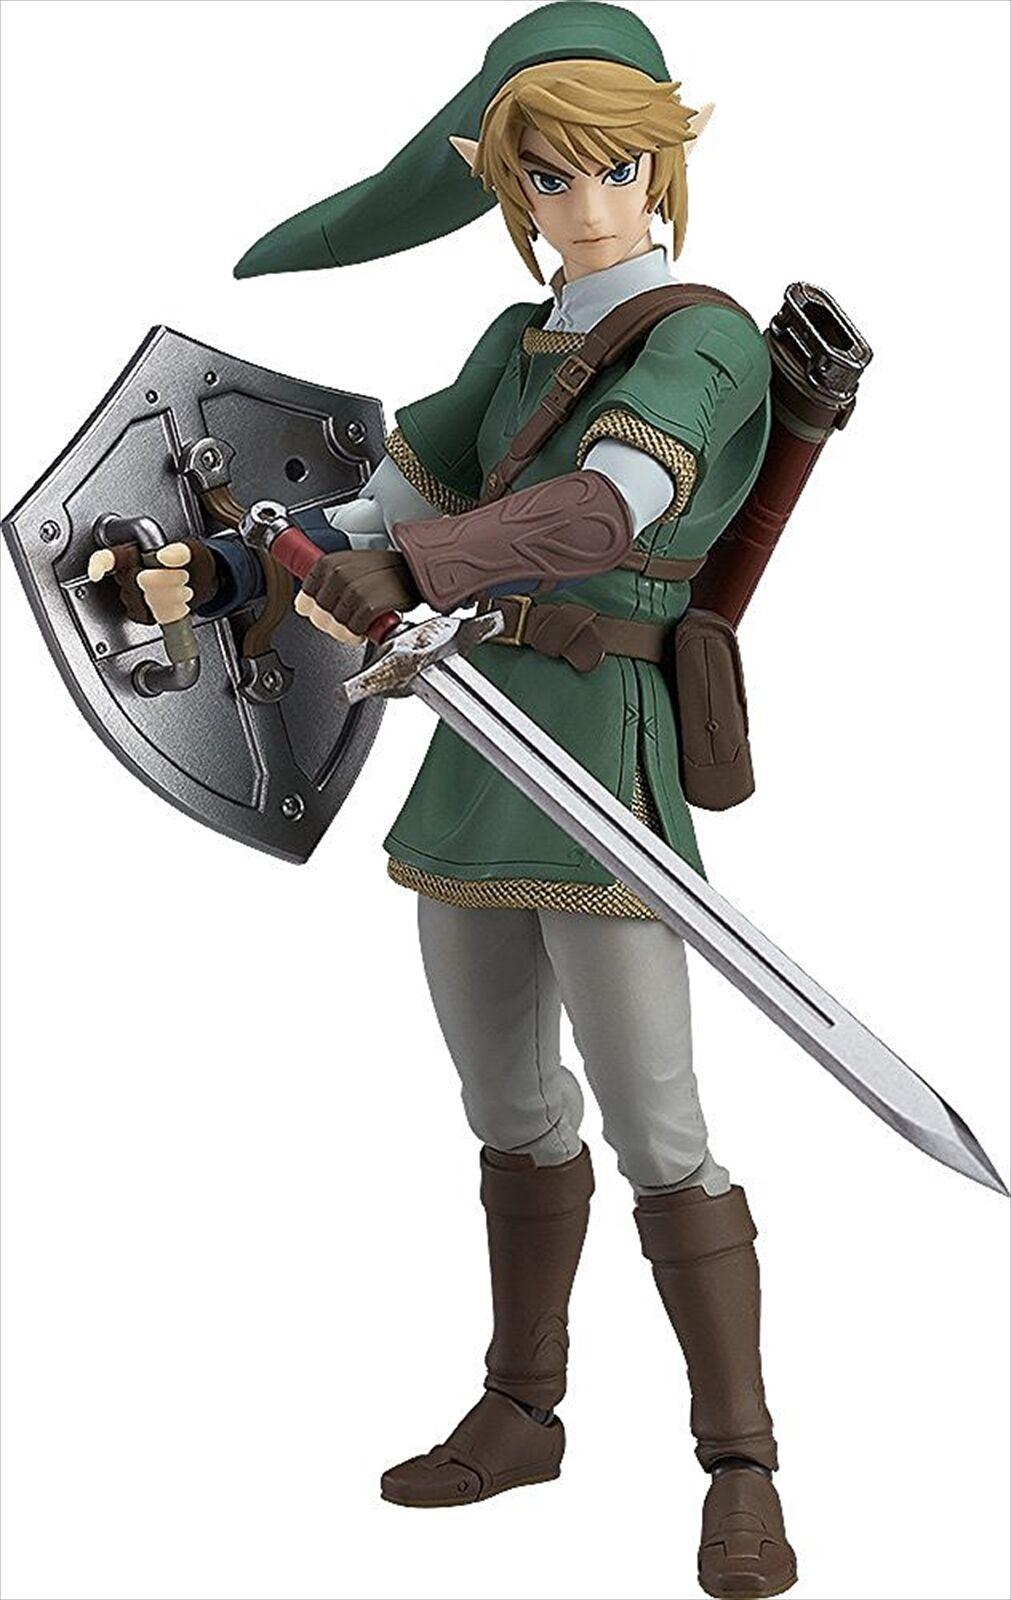 Good Smile figma The Legend of Zelda Twilight Princess Link DX Edition Figure